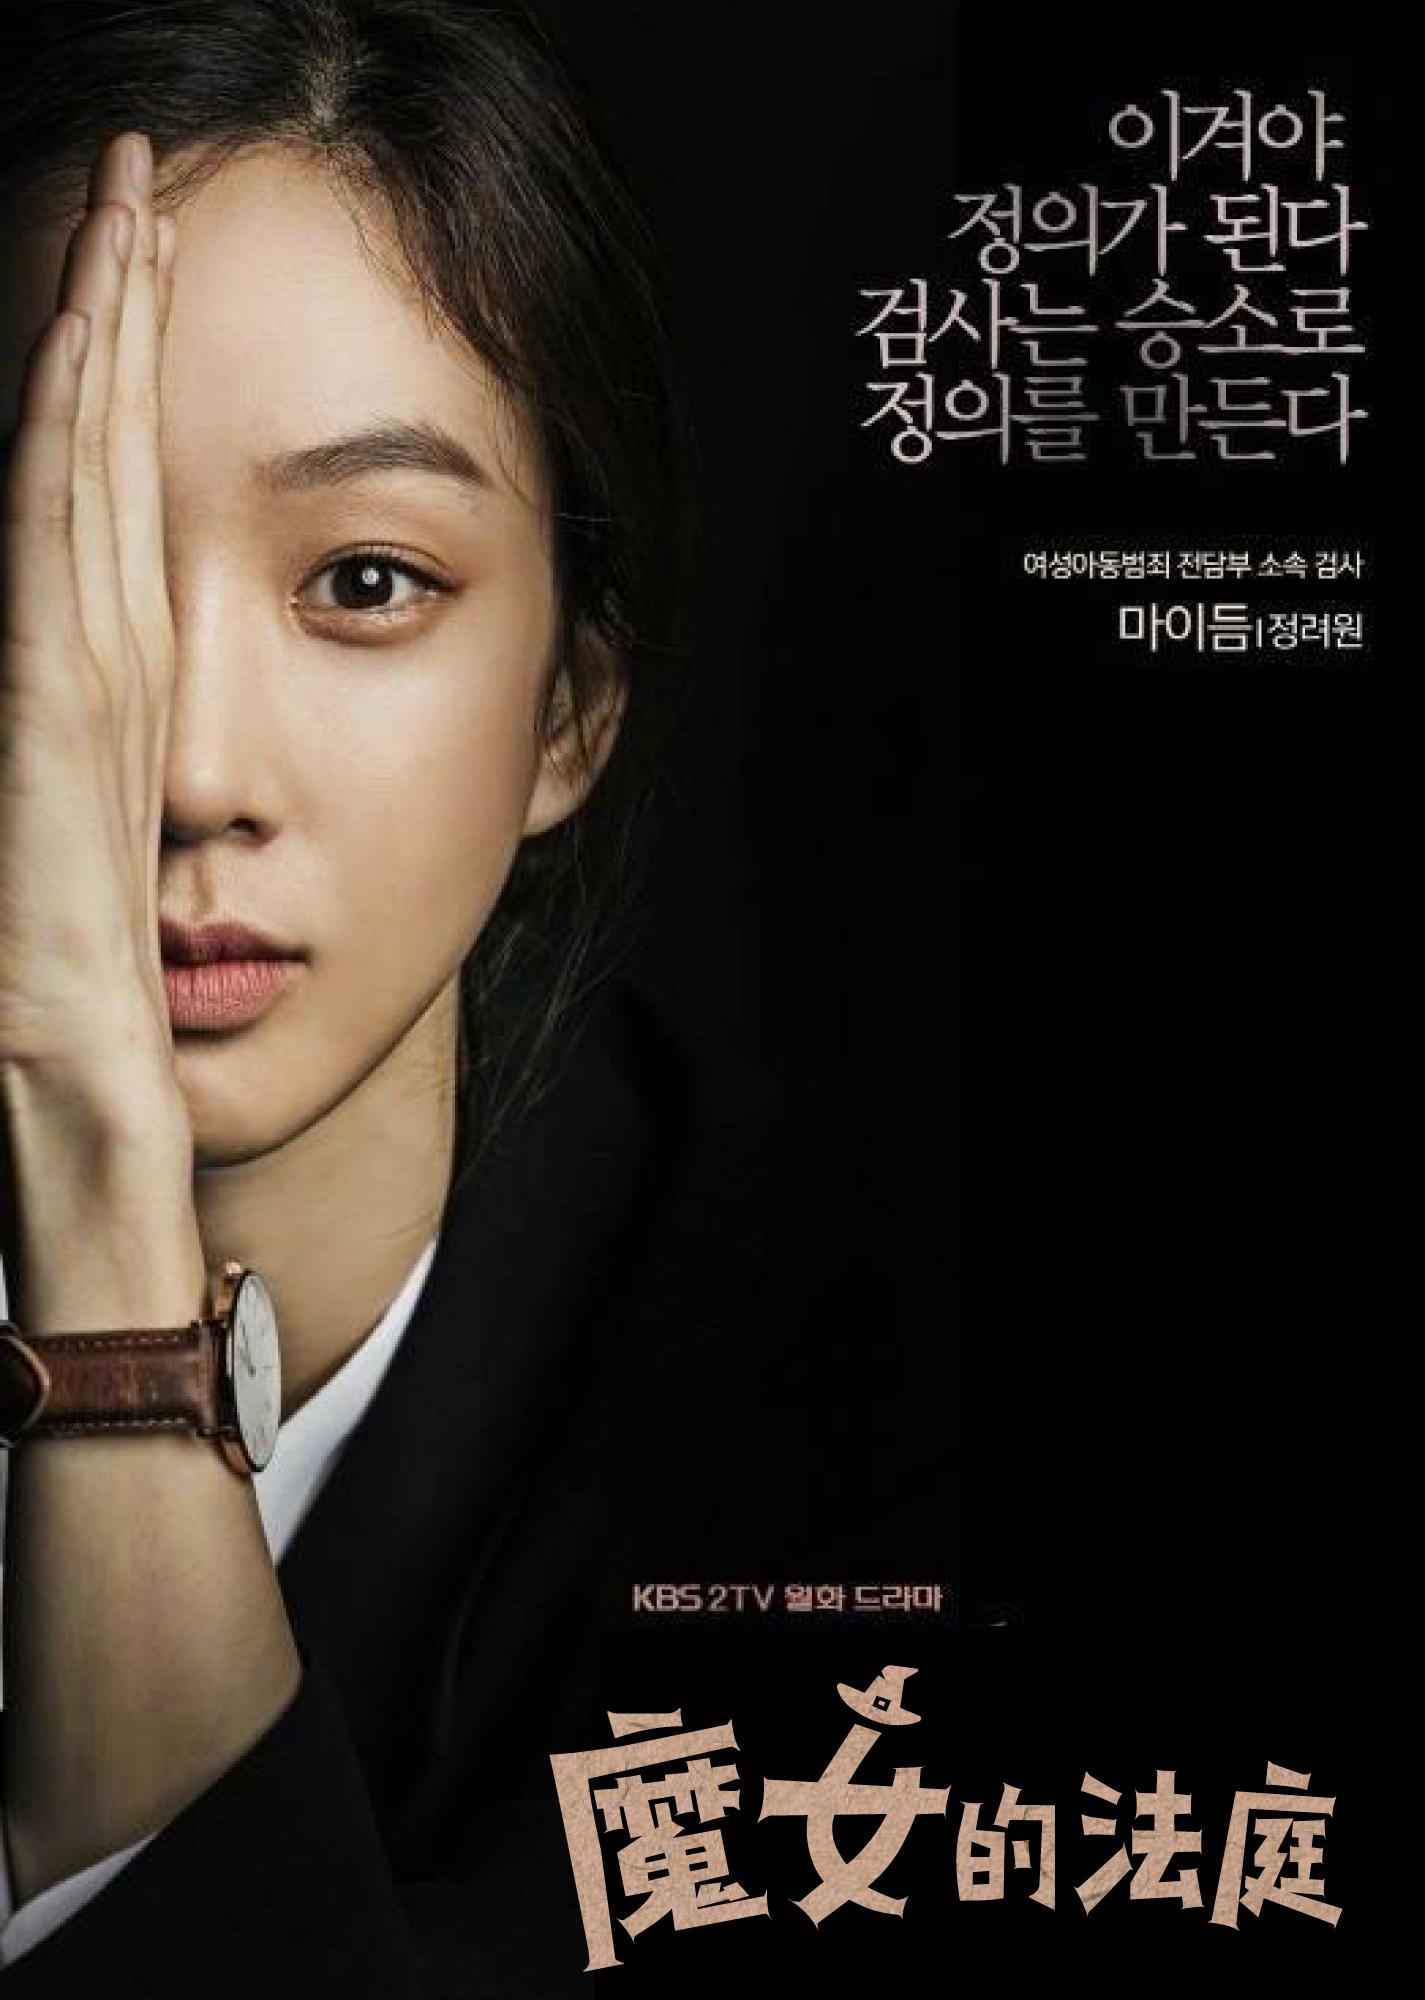 Pin by LINE TV on 戲劇橫/直圖 Korean drama movies, Kdrama